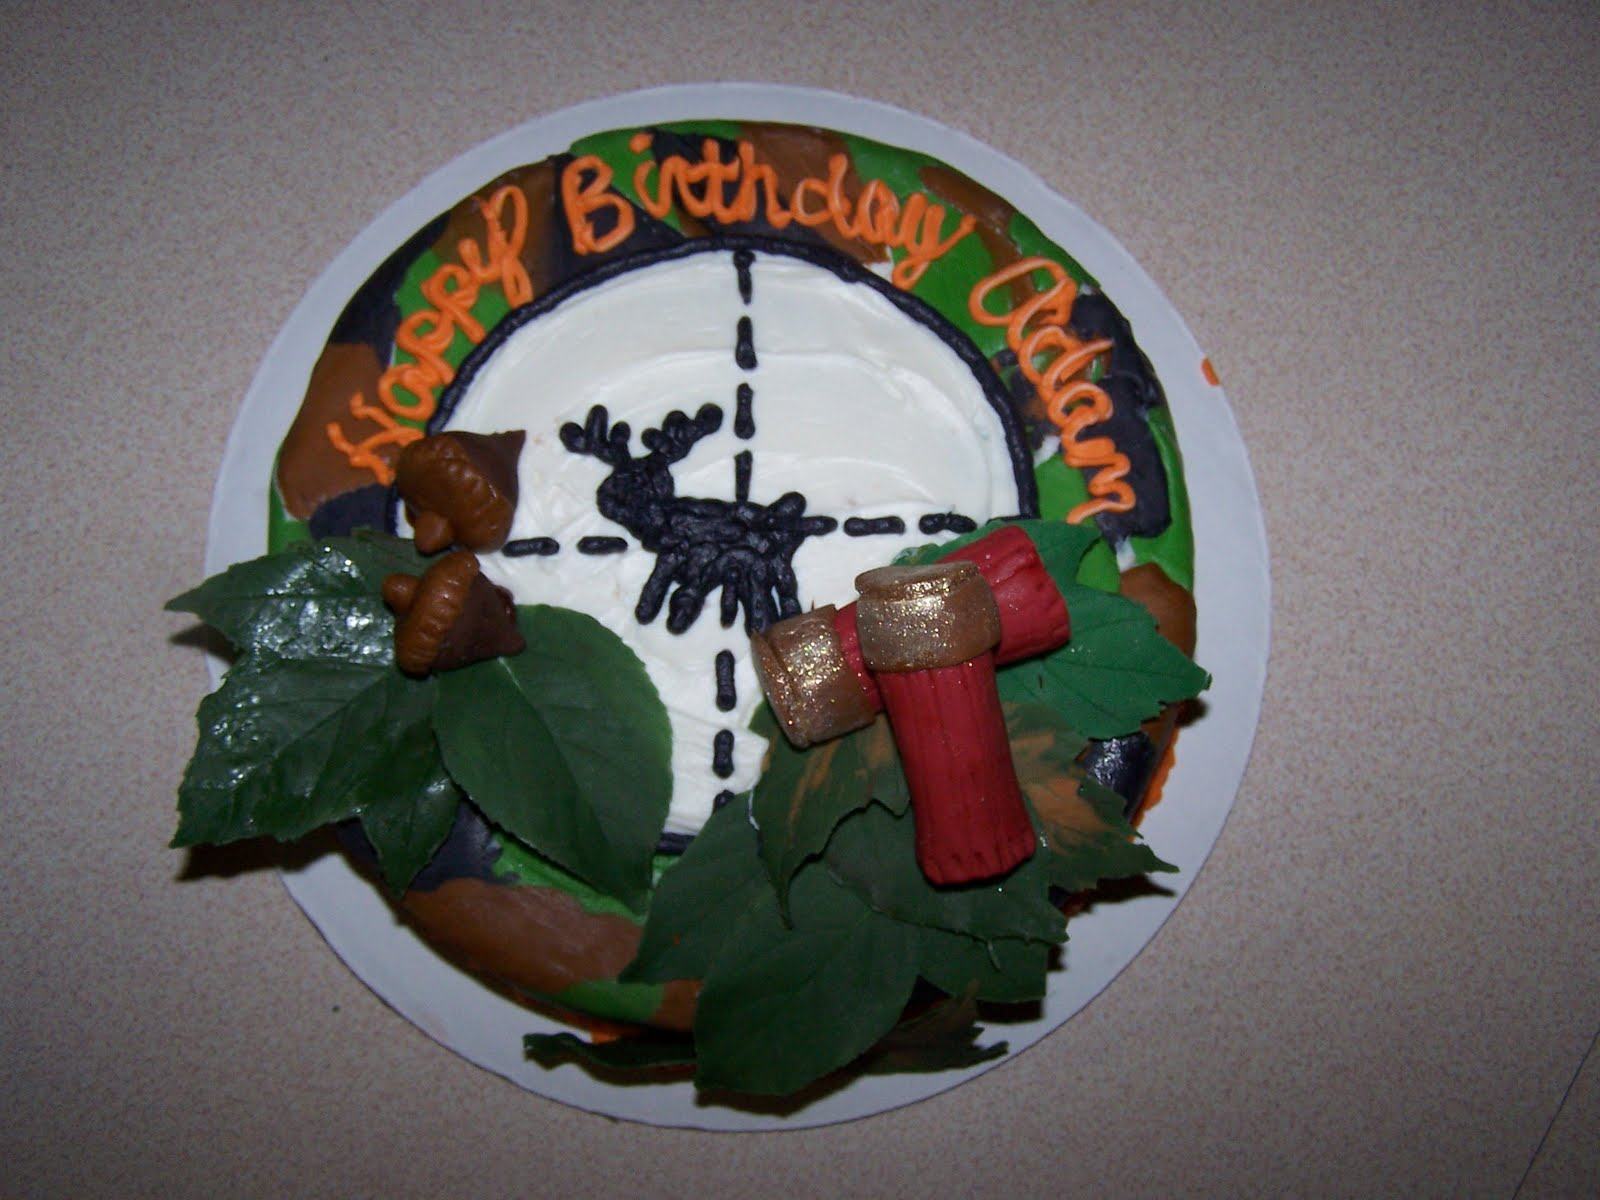 Hunting Cakes Http Juliedalycakes Blogspot Com 2010 10 Hunting Cake